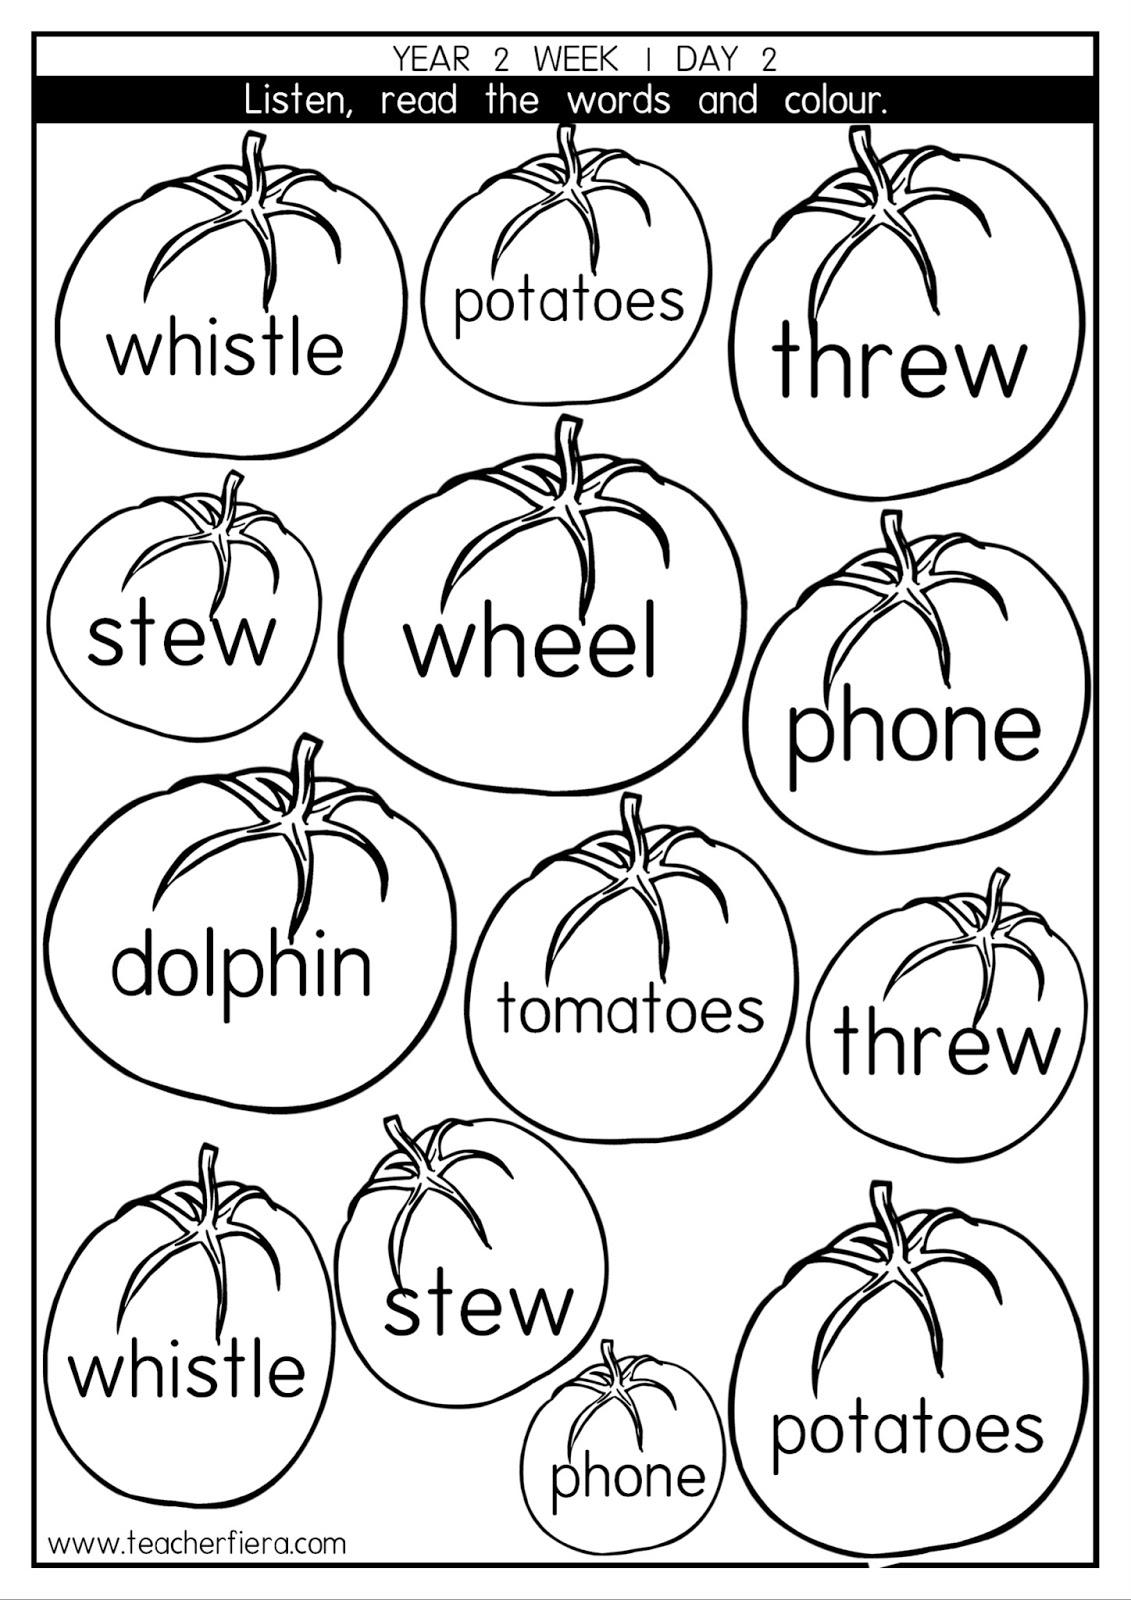 Teacherfiera Year 2 Phonics Lessons Week 2